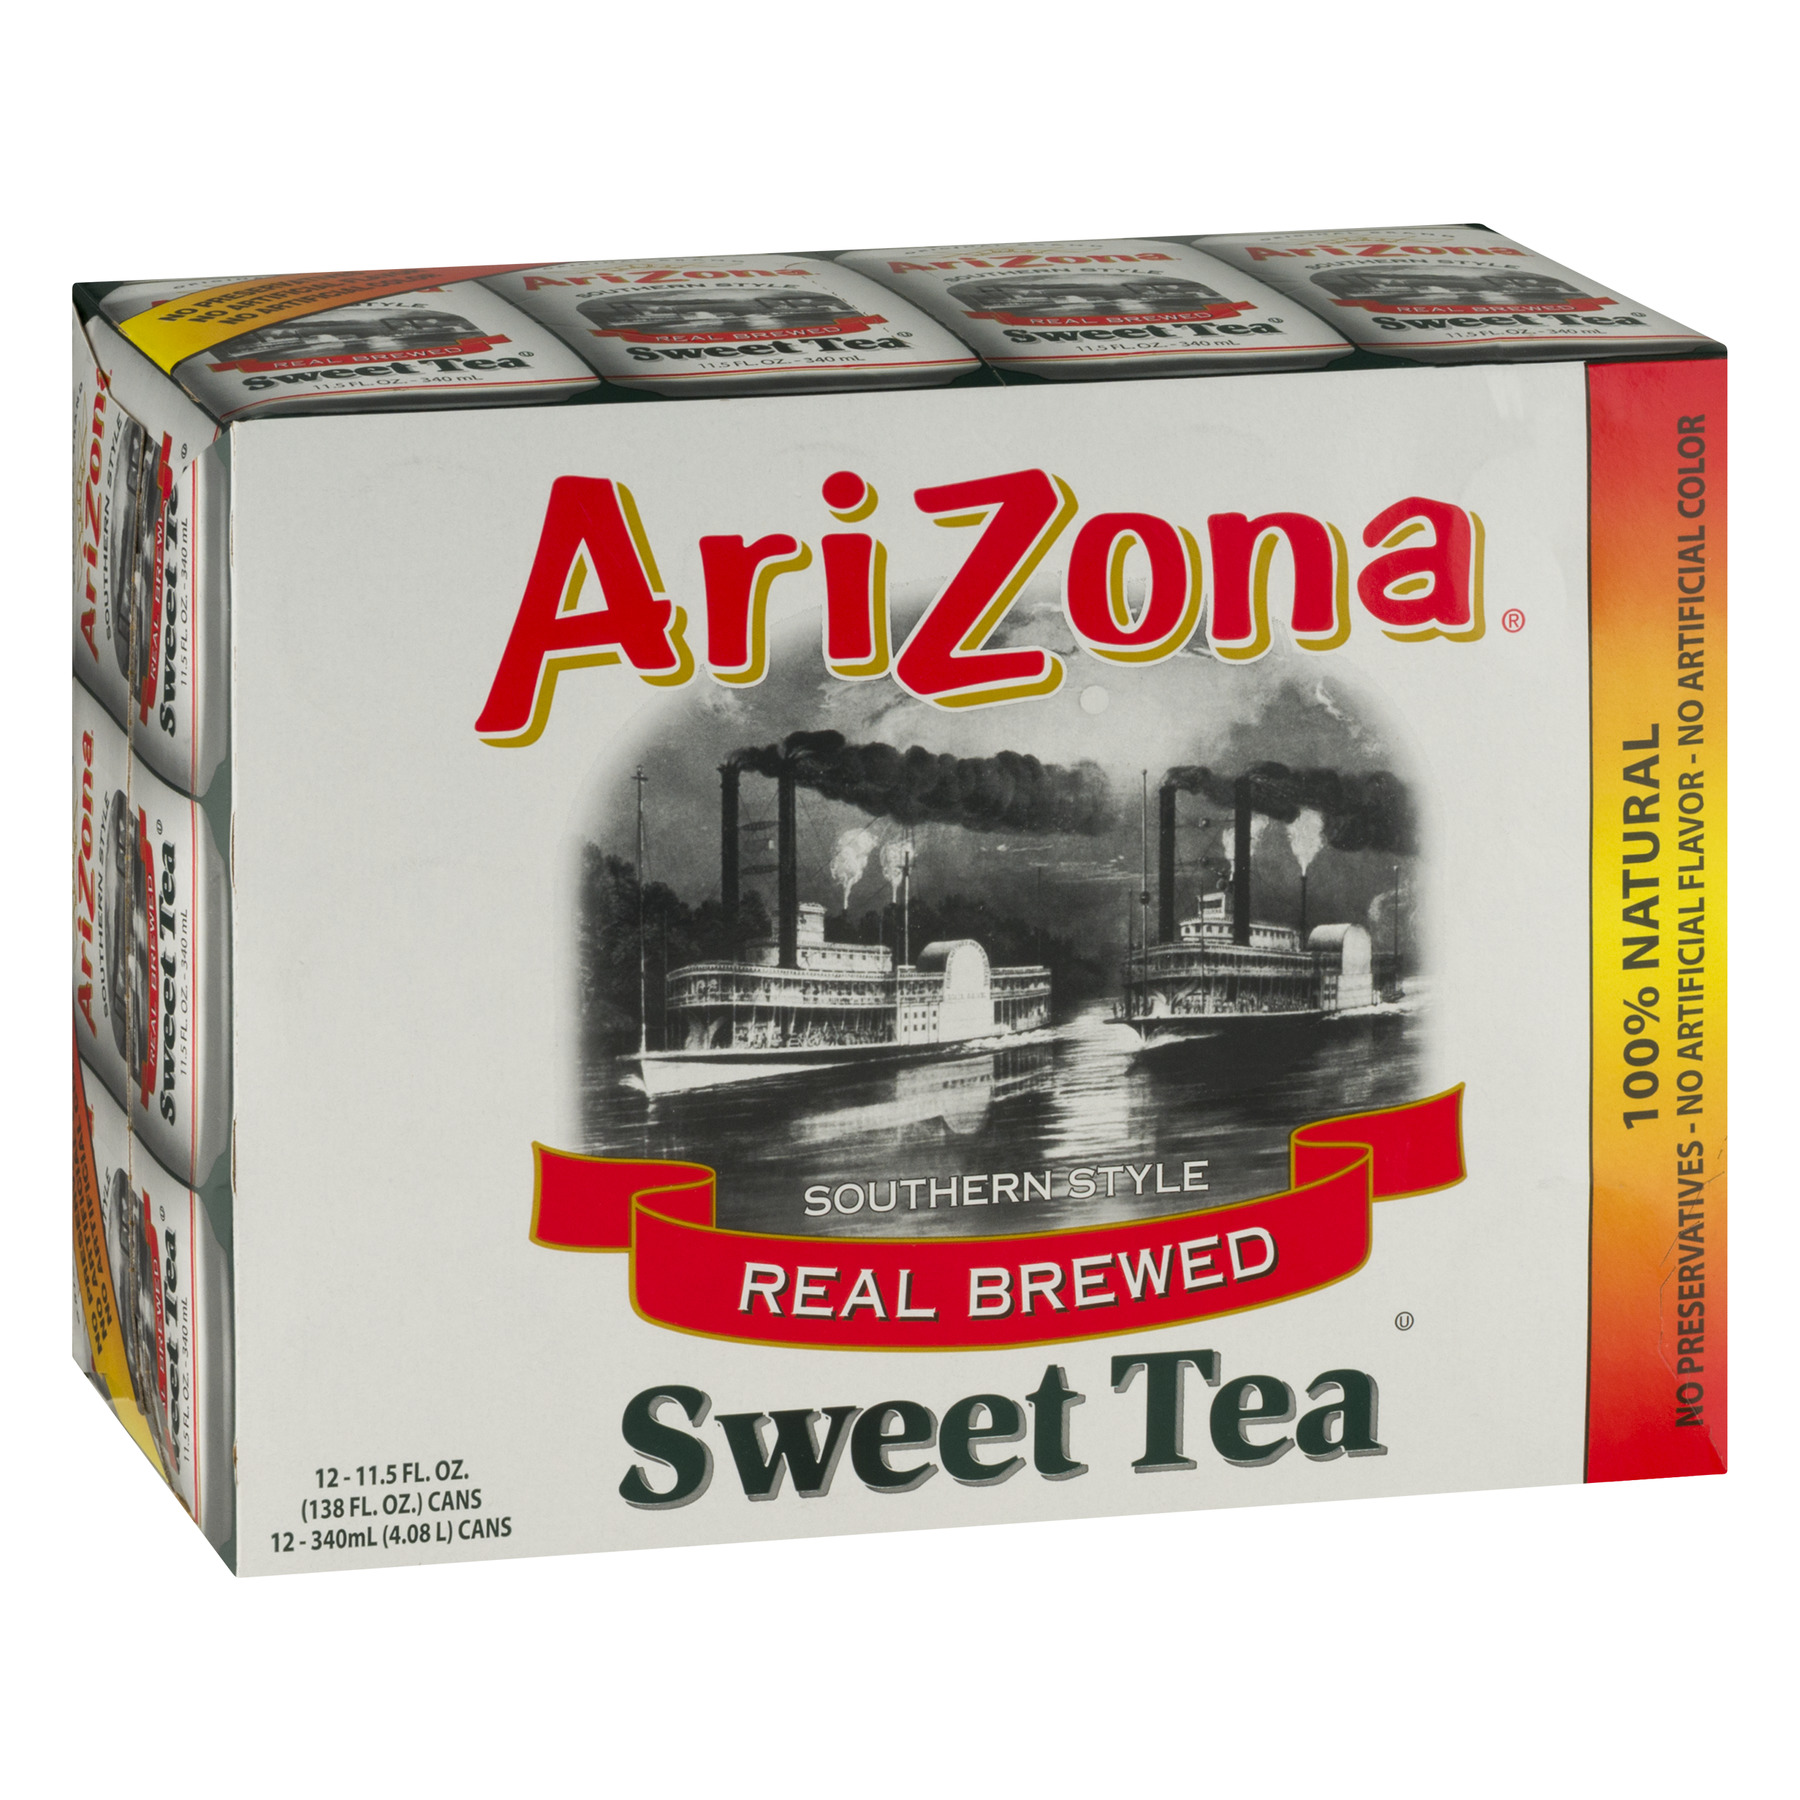 (24 Cans) Arizona Southern Style Real Blend Sweet Tea, 11.5 Fl Oz